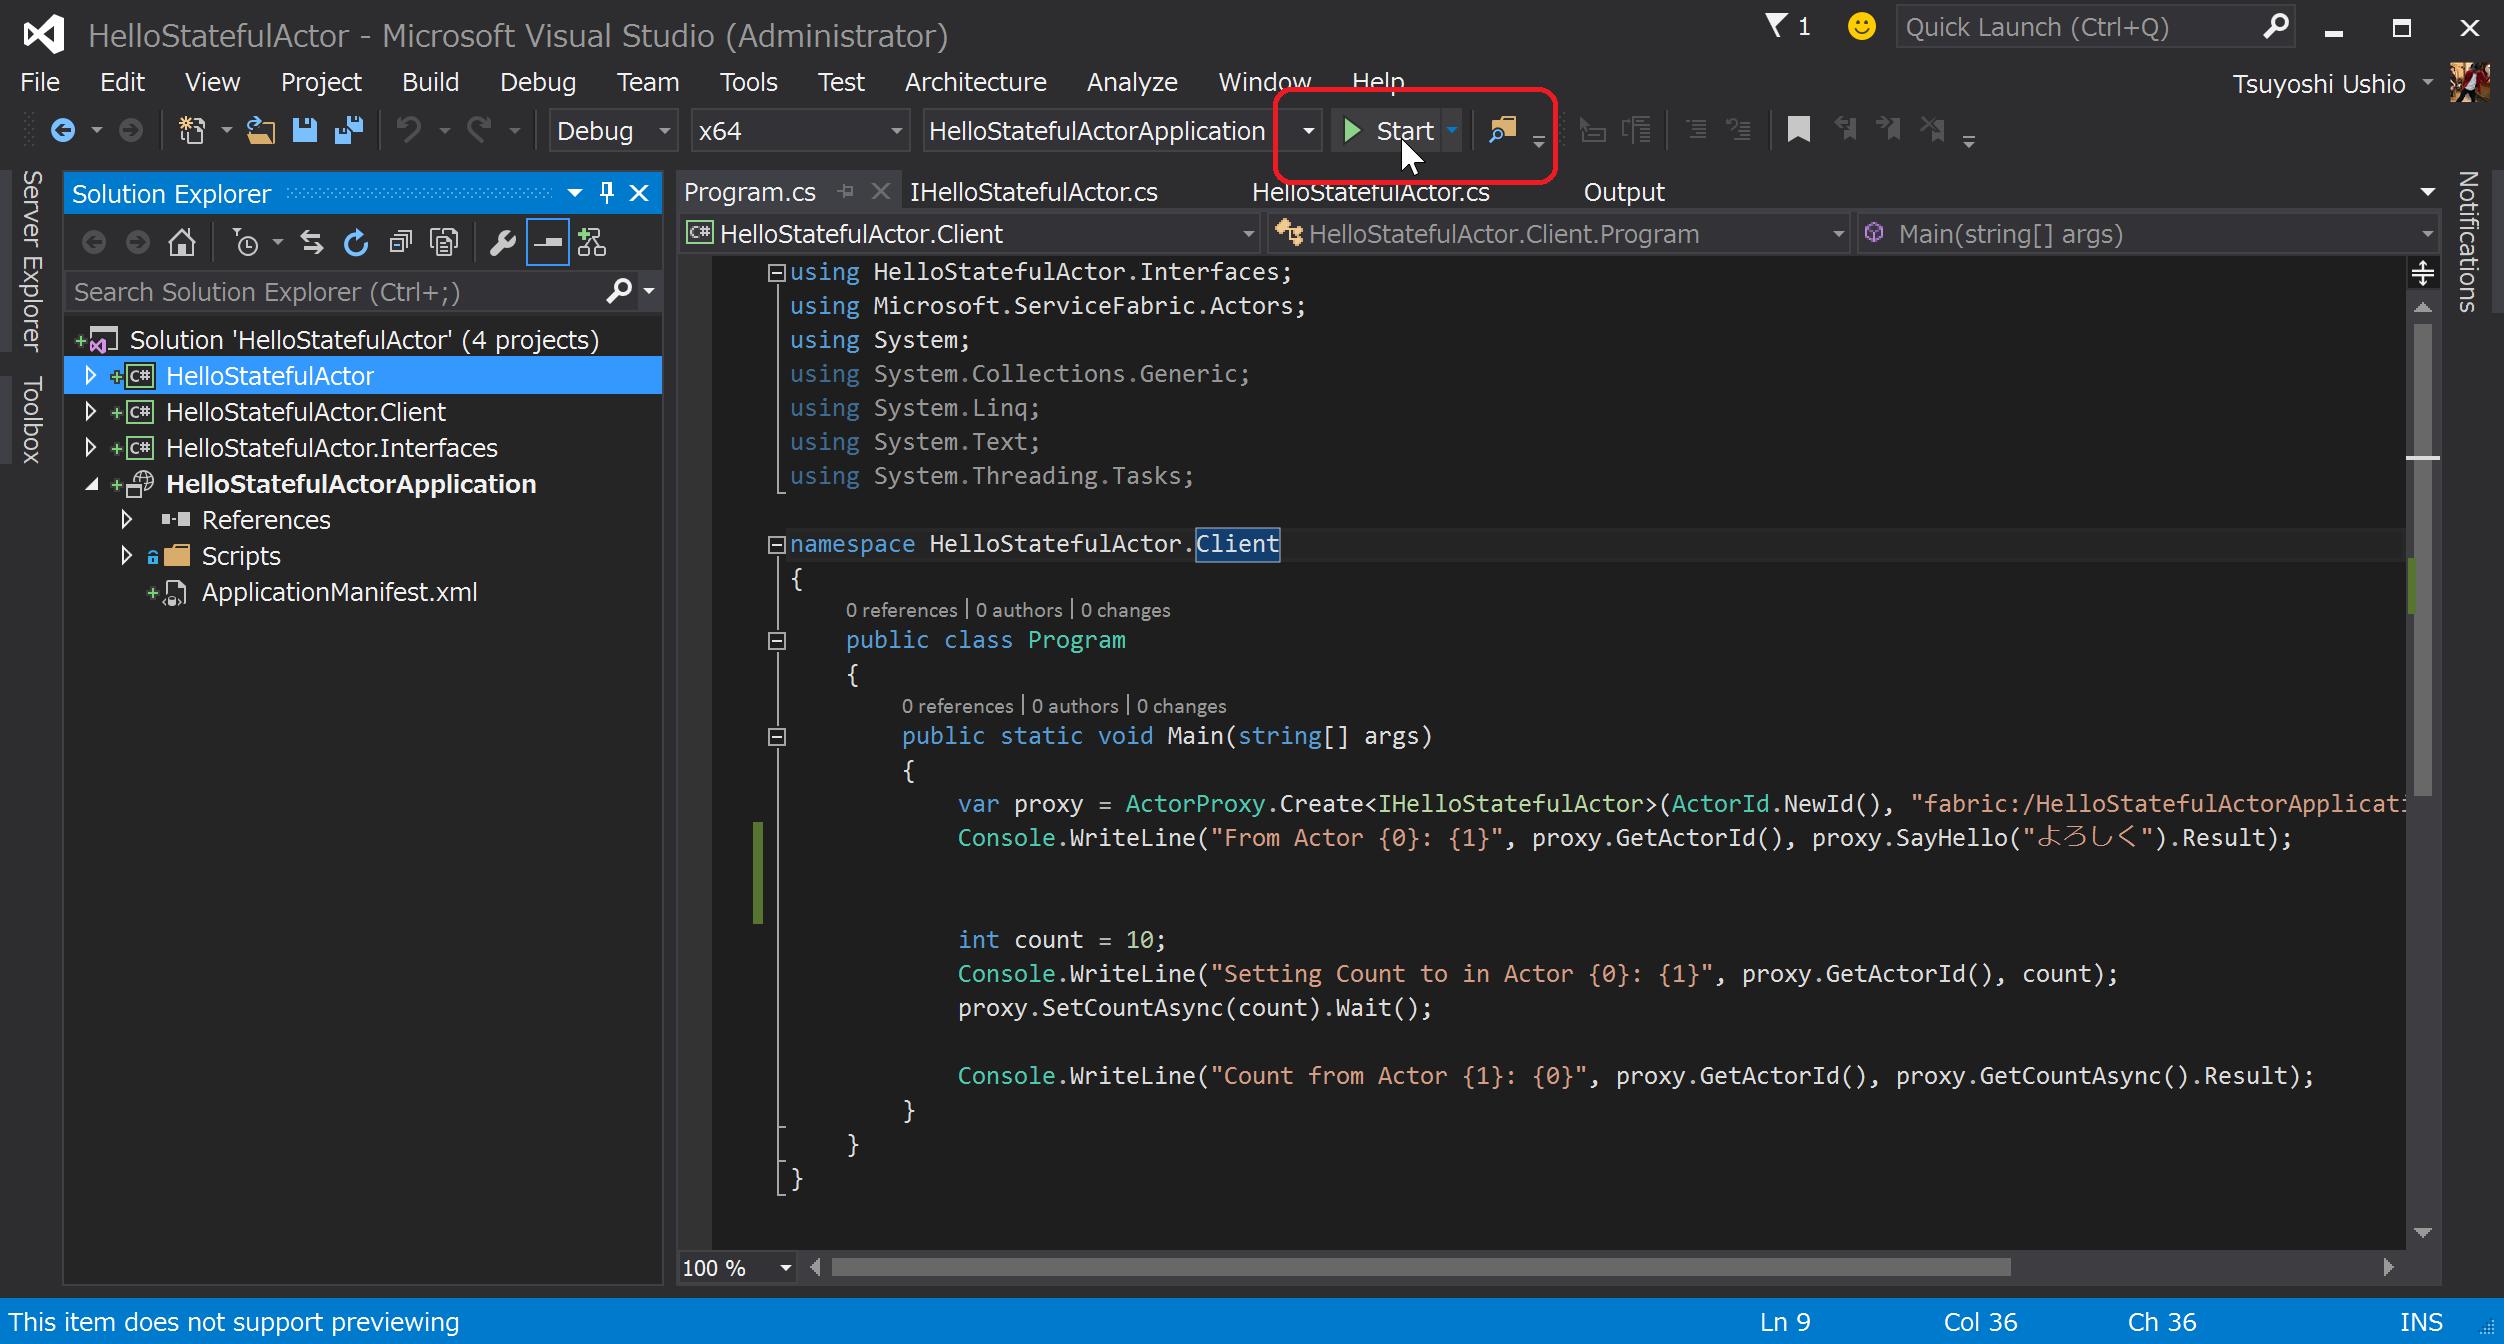 SnapCrab_HelloStatefulActor - Microsoft Visual Studio (Administrator)_2015-5-21_14-21-47_No-00.png